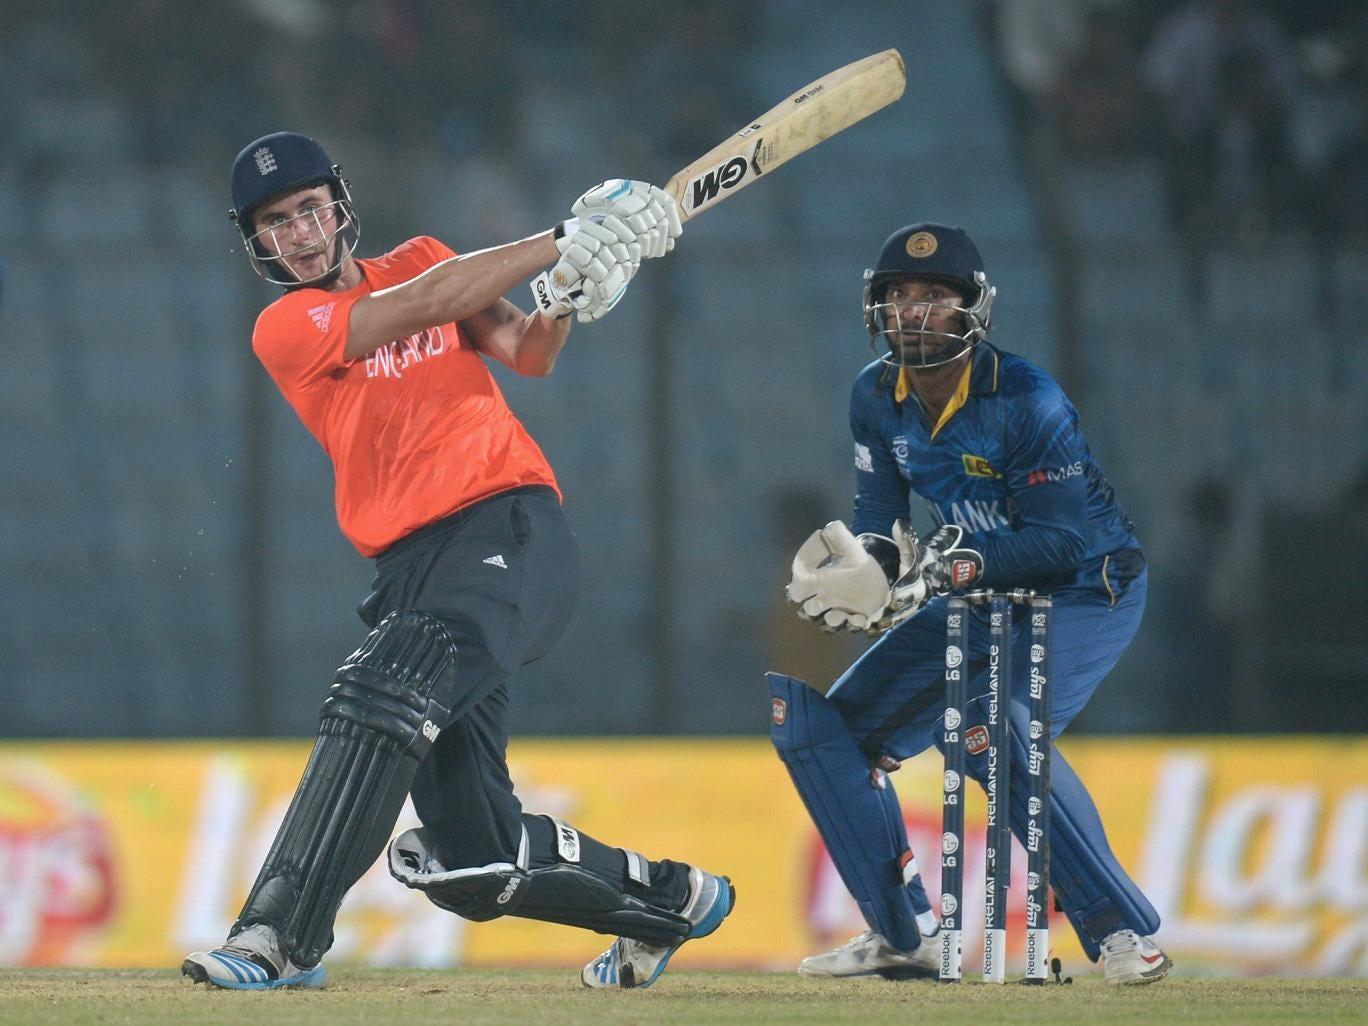 Alex Hales of England hits out for six runs during the ICC World Twenty20 Bangladesh 2014 Group 1 match between England and Sri Lanka at Zahur Ahmed Chowdhury Stadium